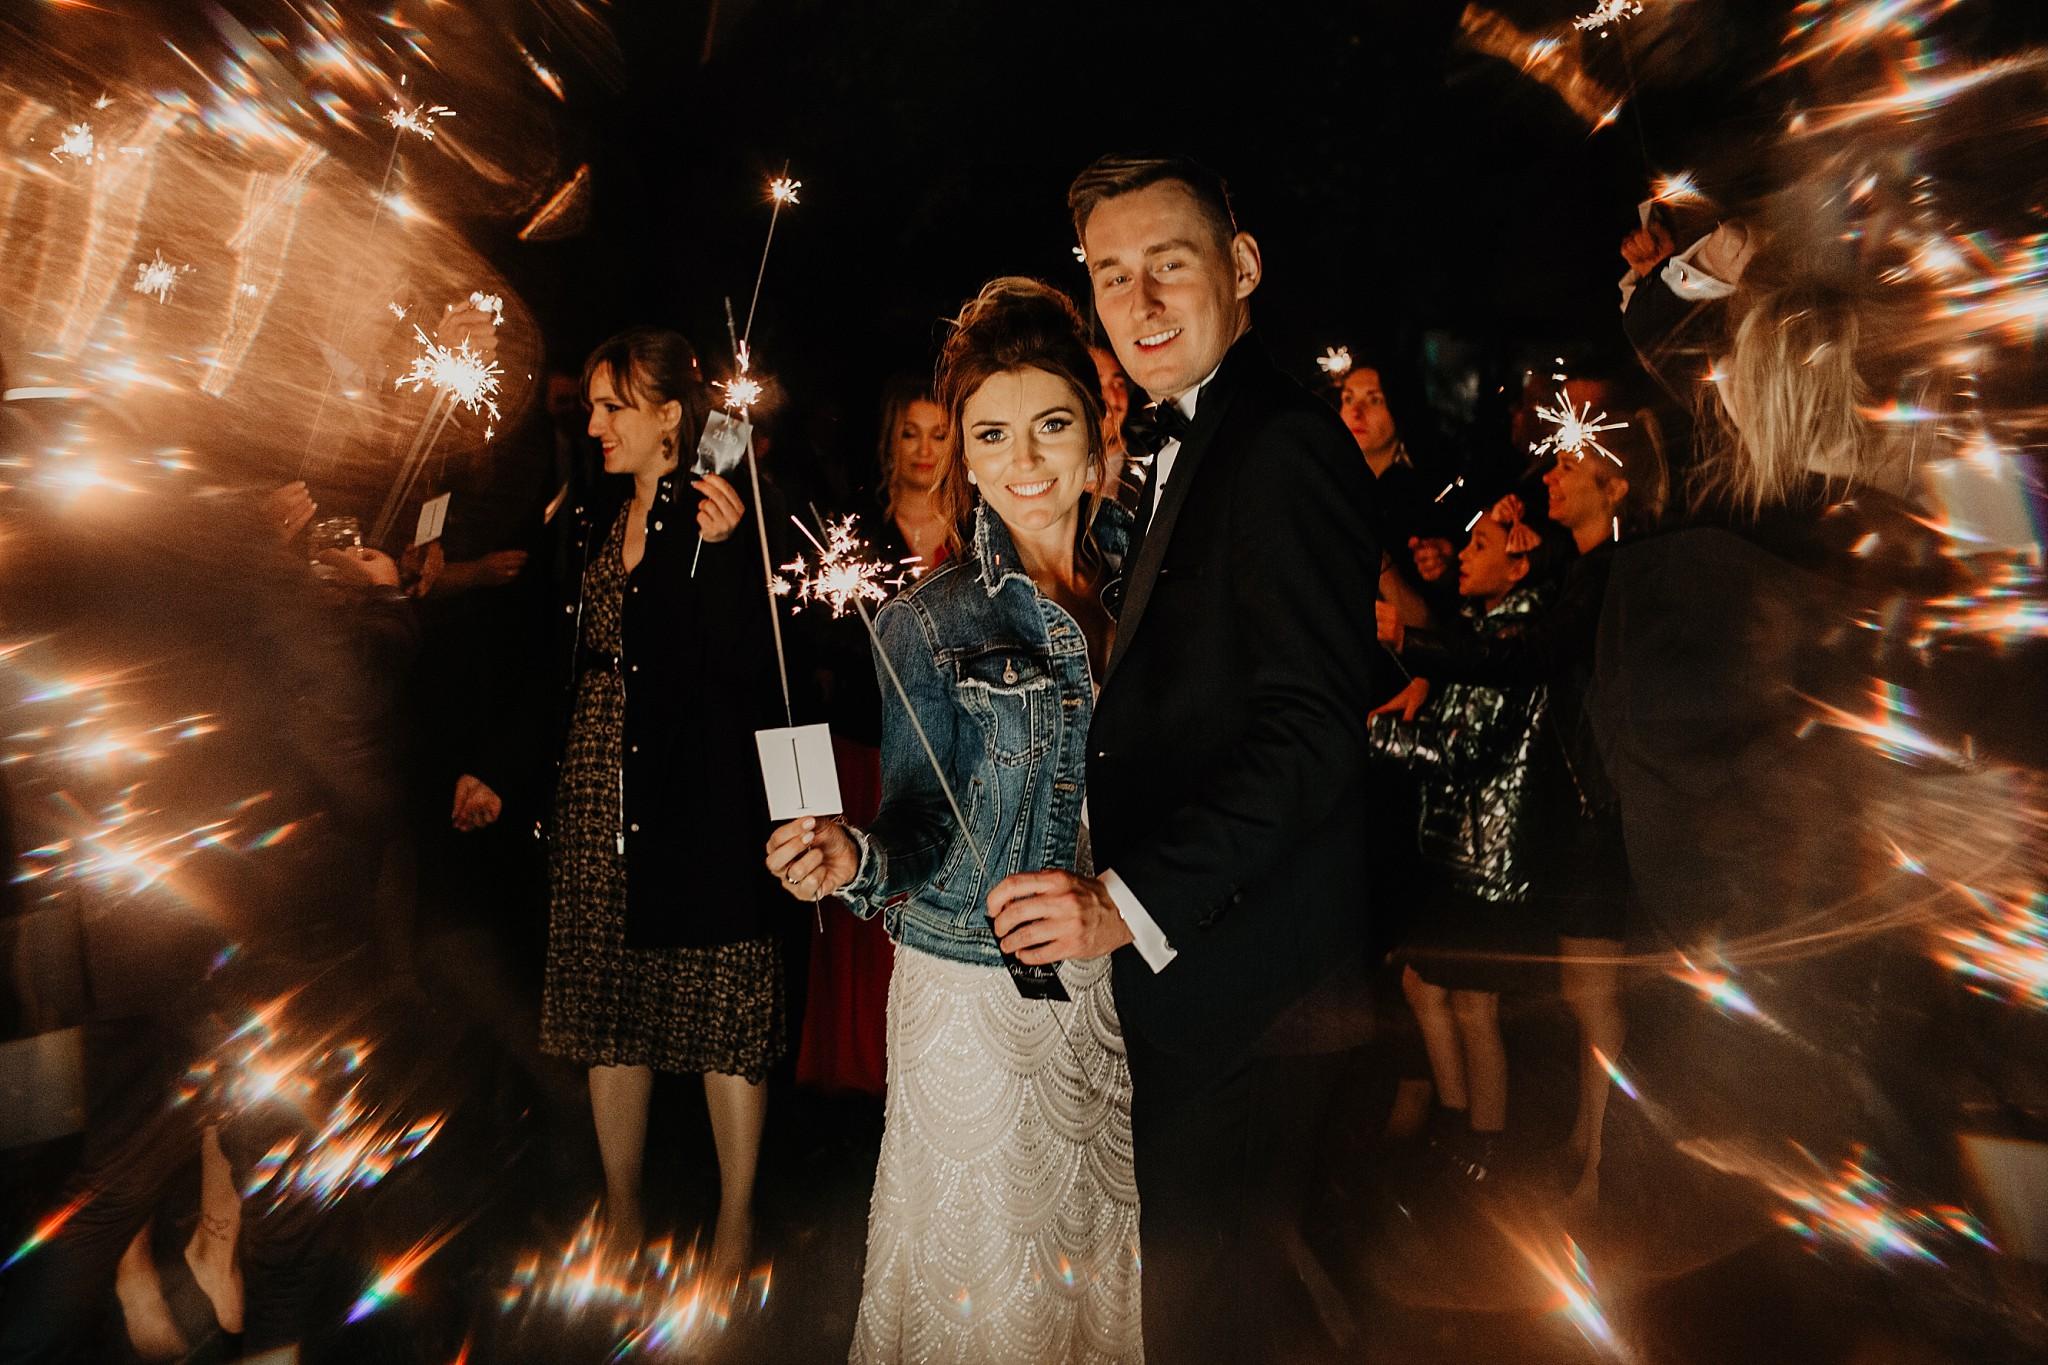 fotograf poznan wesele dobra truskawka piekne wesele pod poznaniem wesele w dobrej truskawce piekna para mloda slub marzen slub koronawirus slub listopad wesele koronawirus 500